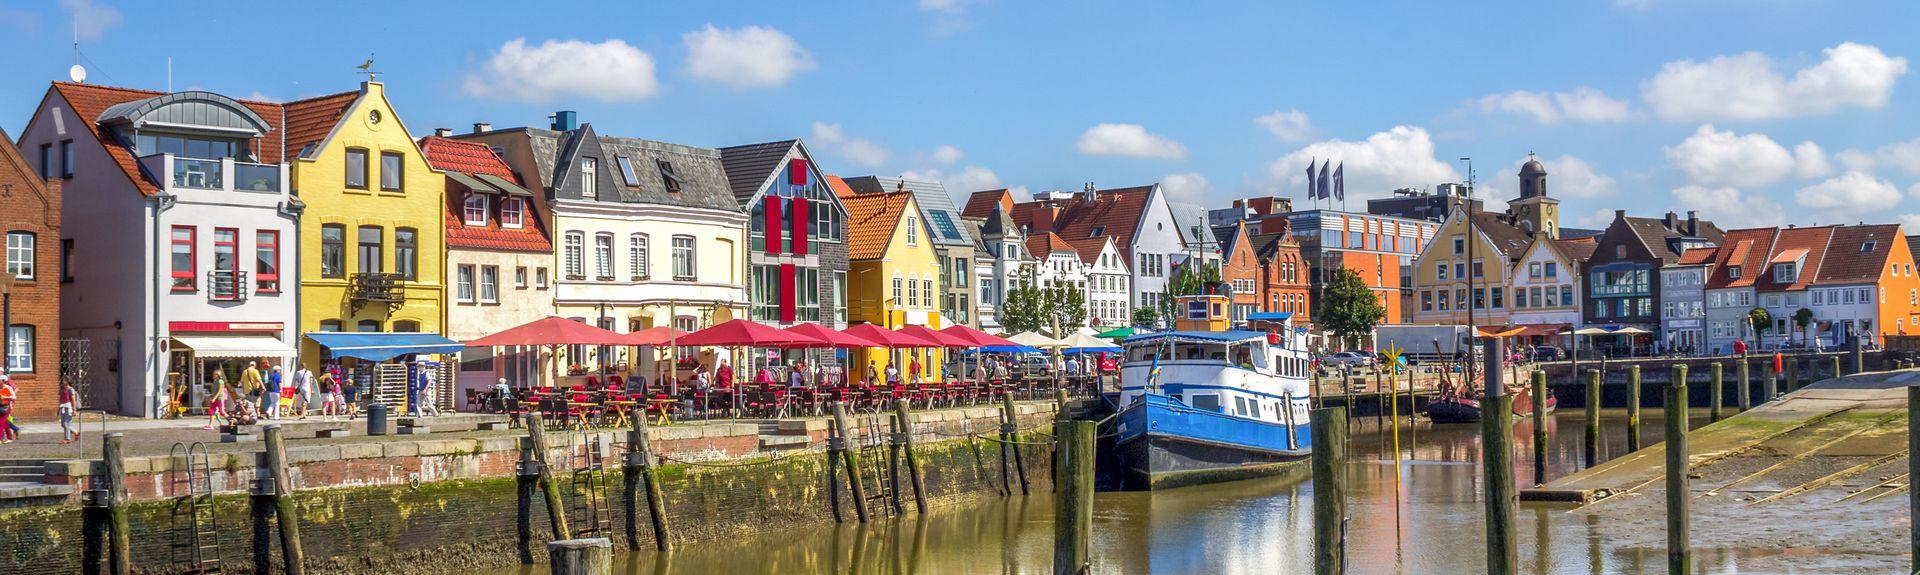 Husum, Germany